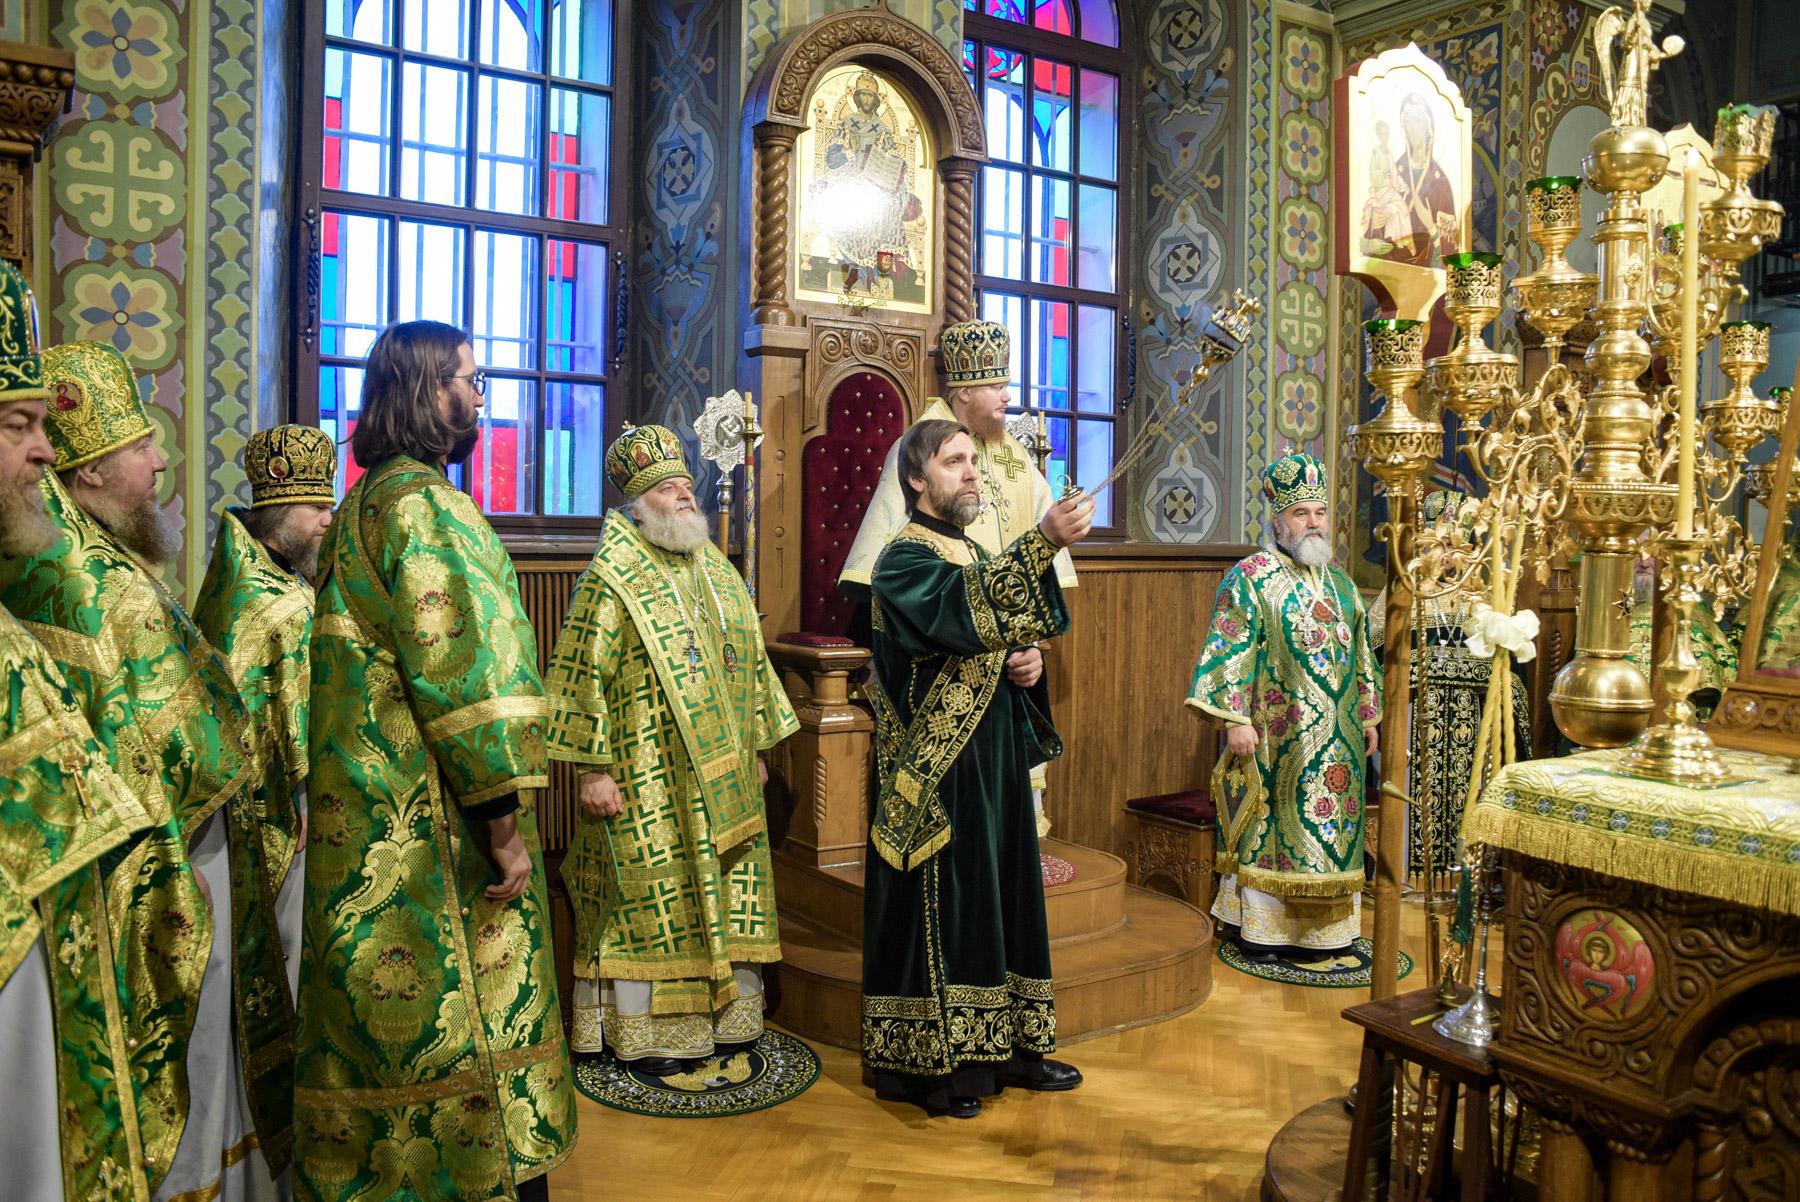 photos of orthodox christmas 0121 2